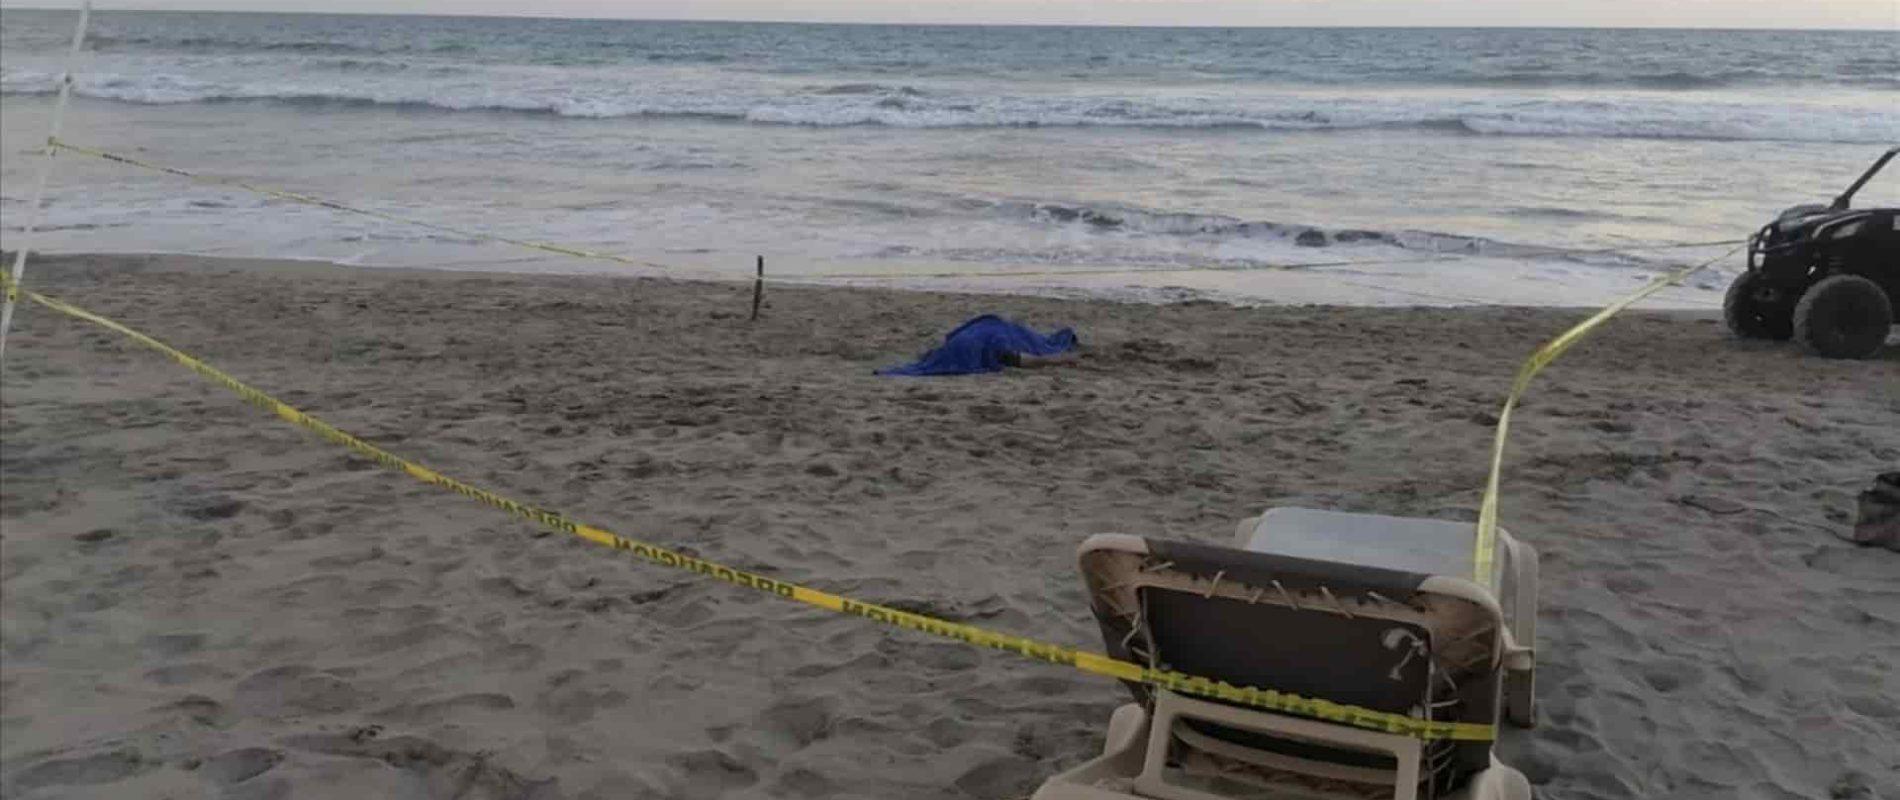 Muere monclovense en playas de Mazatlán: Viviana sufrió un infarto fulminante